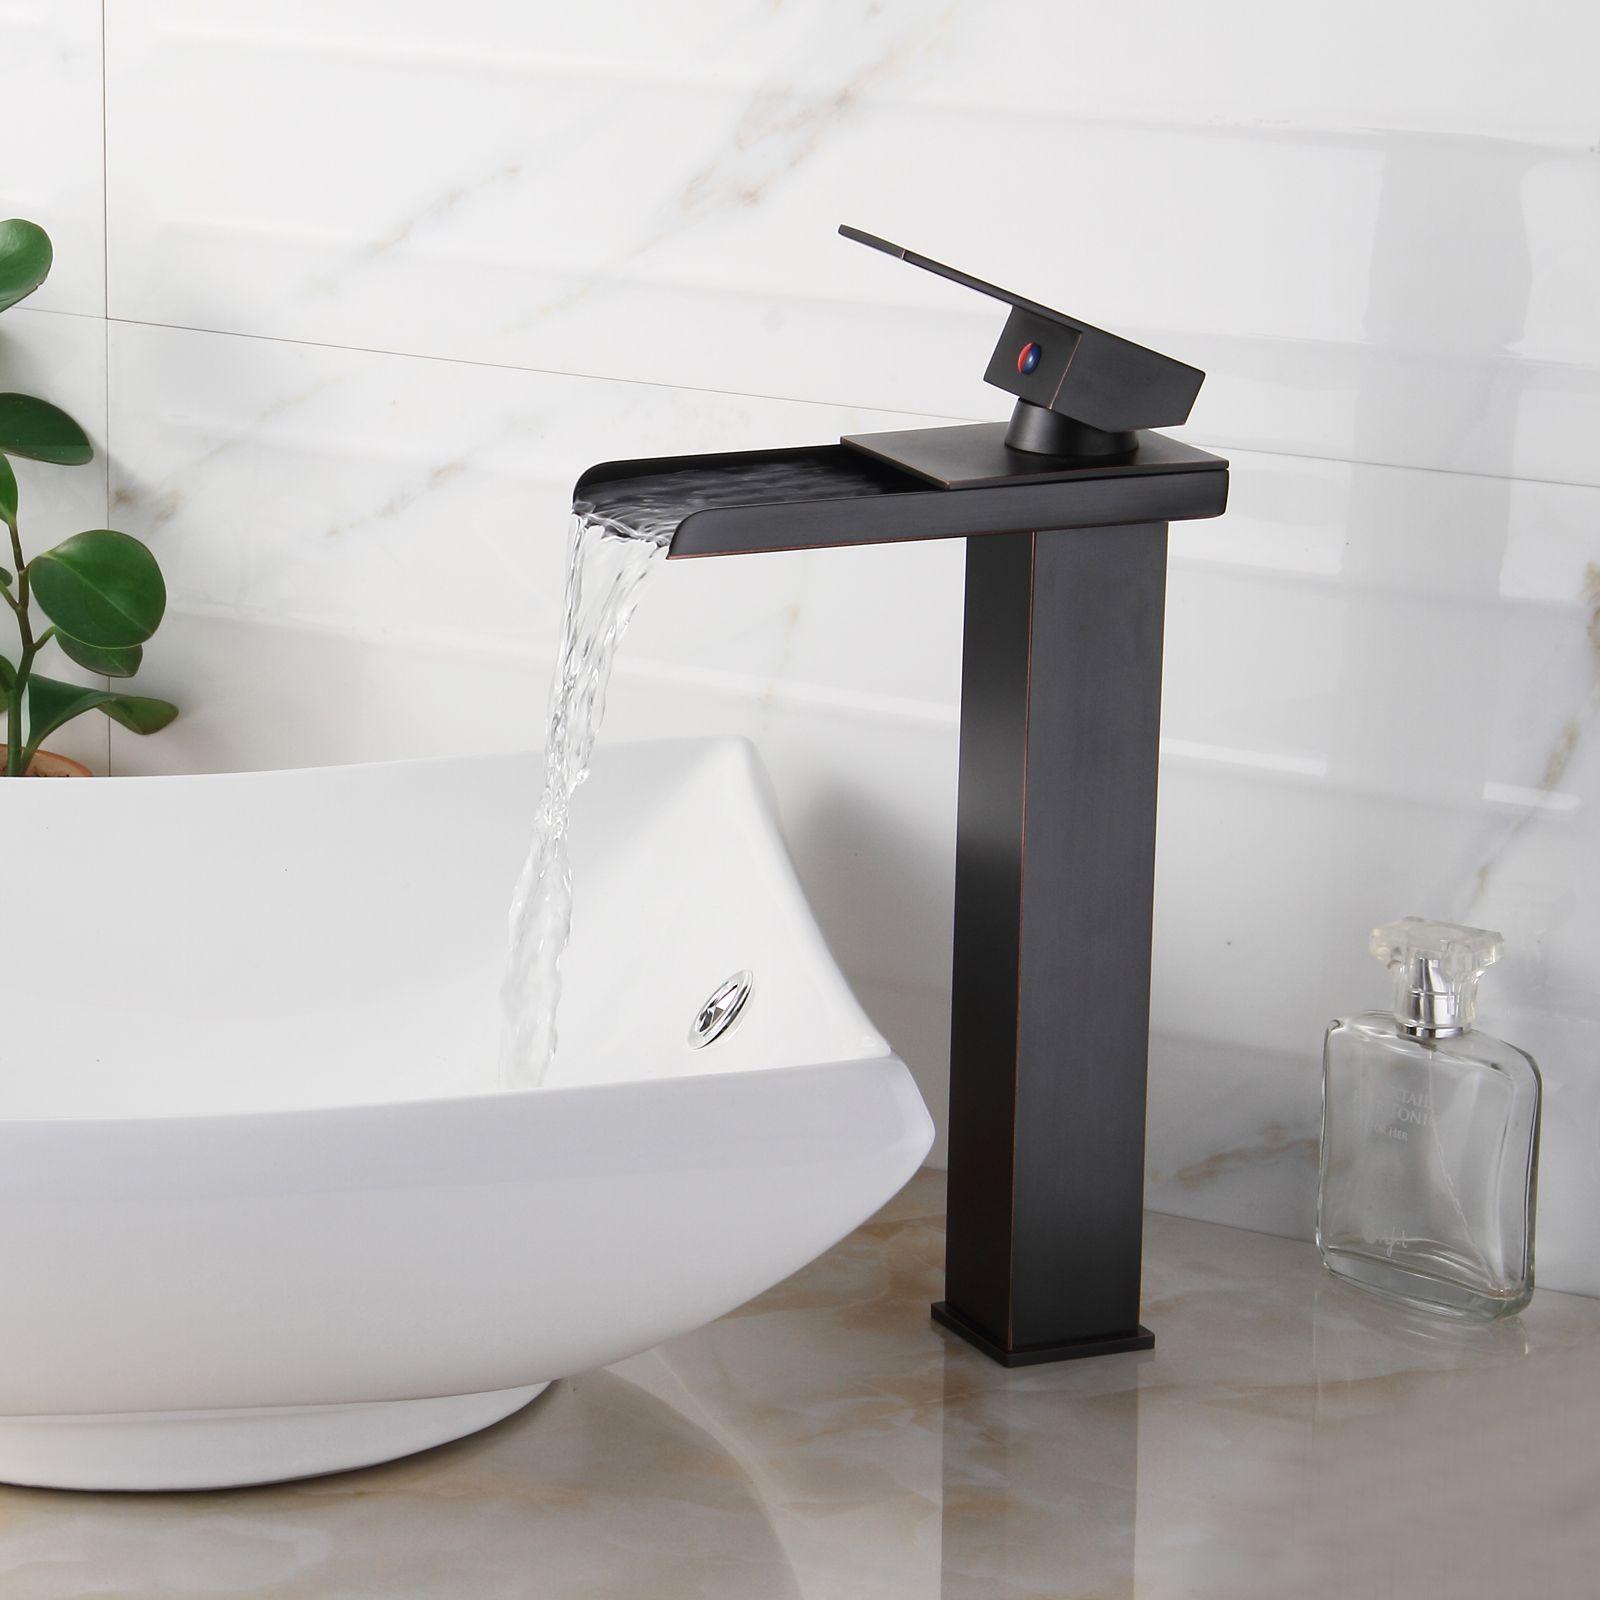 Dfi Vessel Sink Bathroom Faucet Vessel Sink Bathroom Bathroom Faucets Farmhouse Sink Faucet